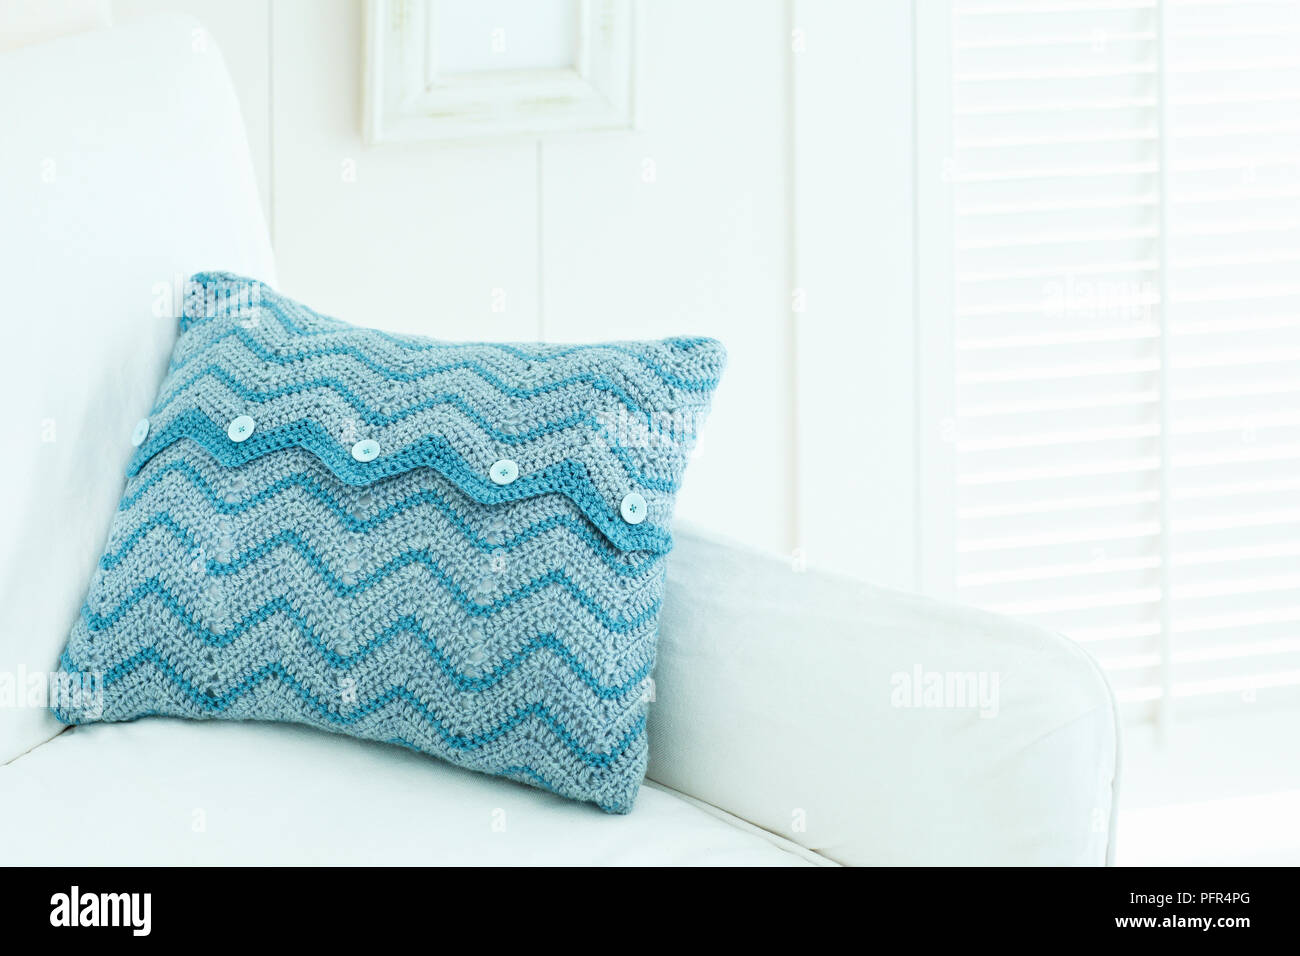 Crochet Cover Imágenes De Stock & Crochet Cover Fotos De Stock - Alamy